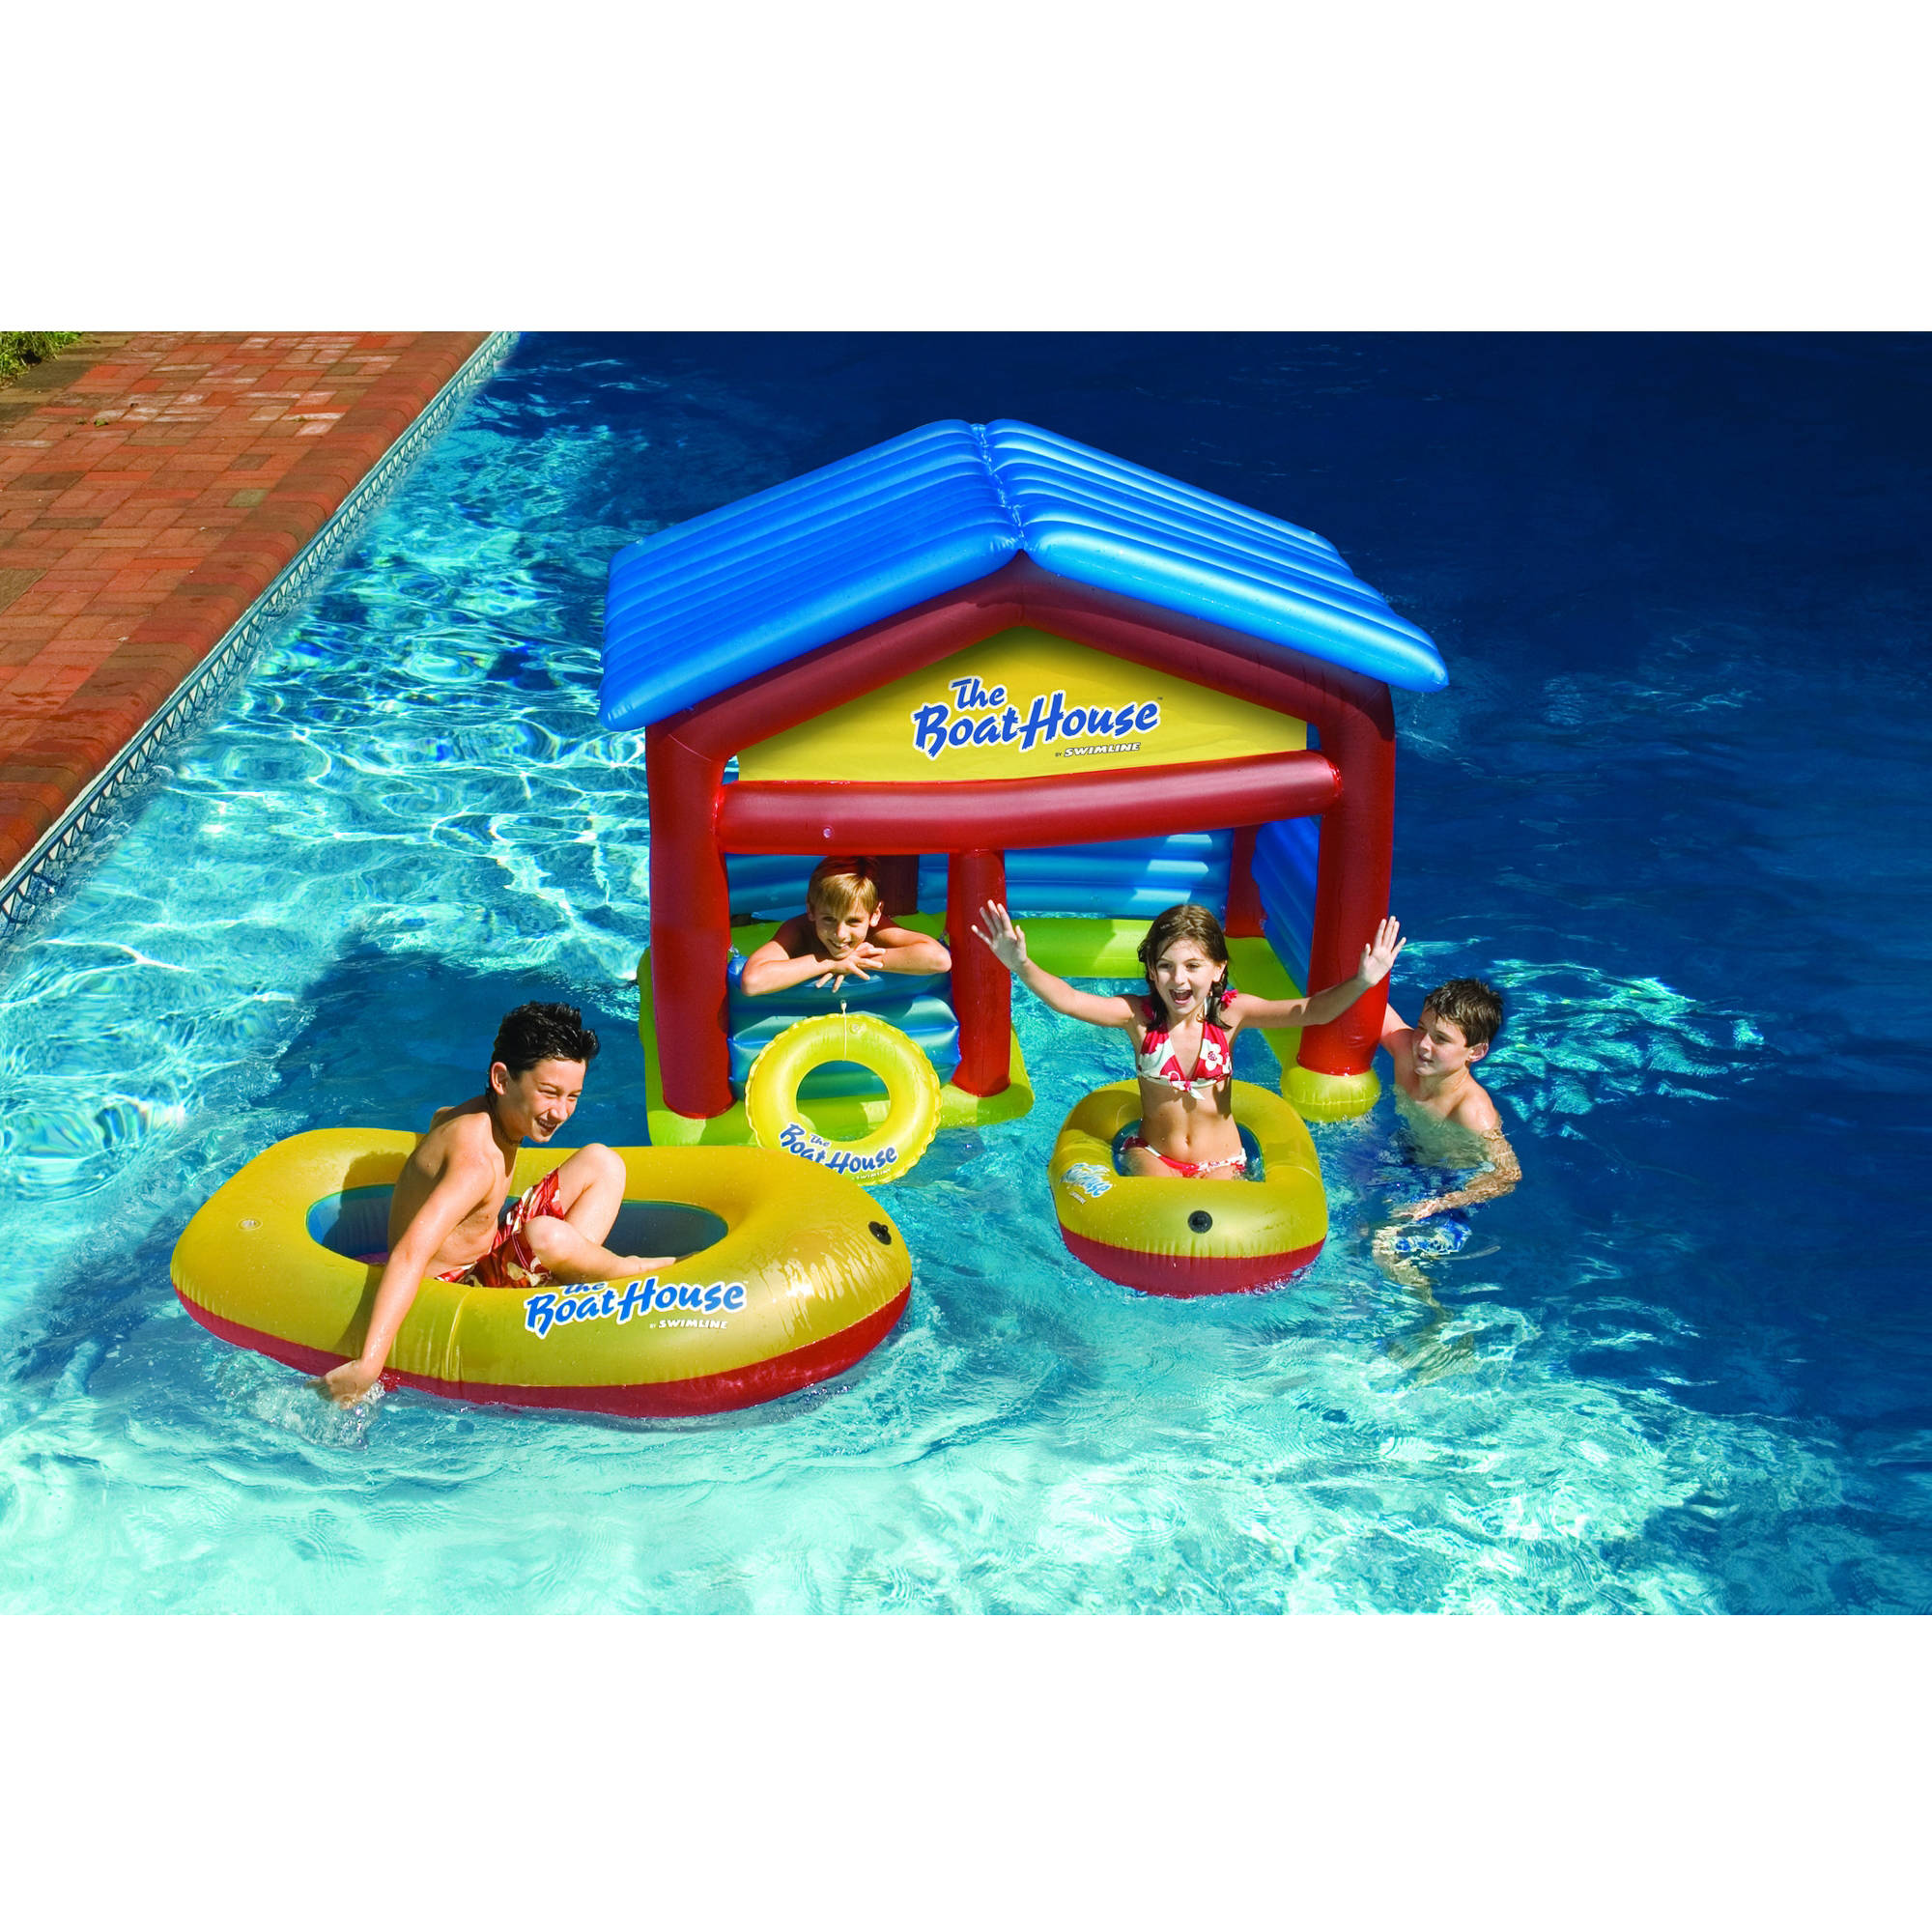 Swimline Boathouse Floating Habitat Inflatable for Swimming Pools by Swimline